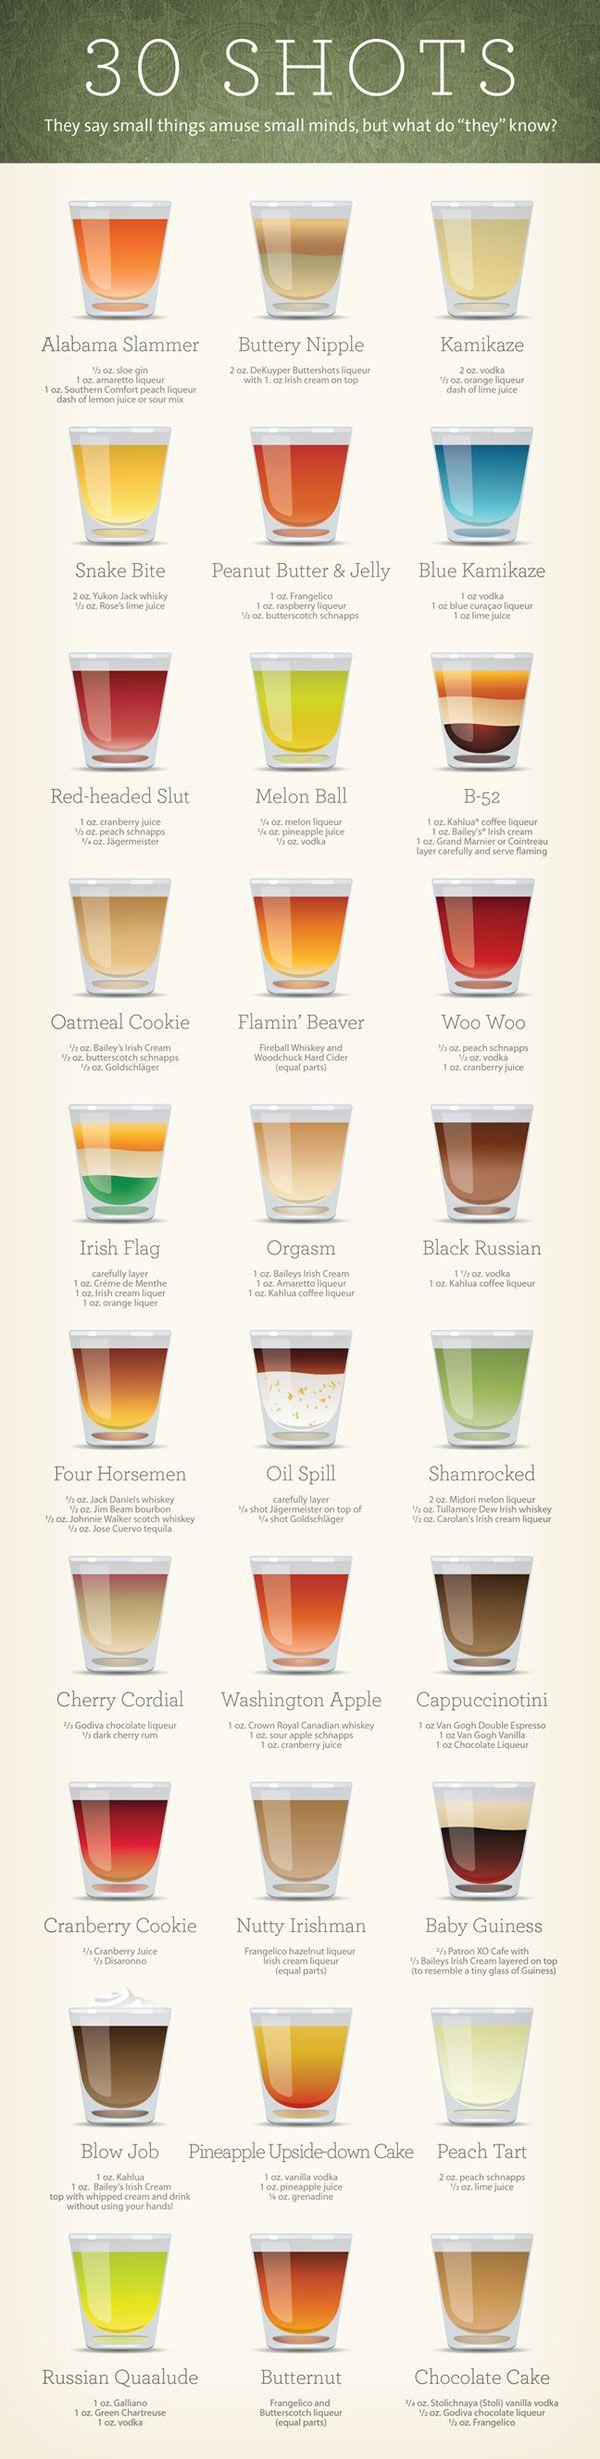 30 chupitos de diseño #infografia #infographic